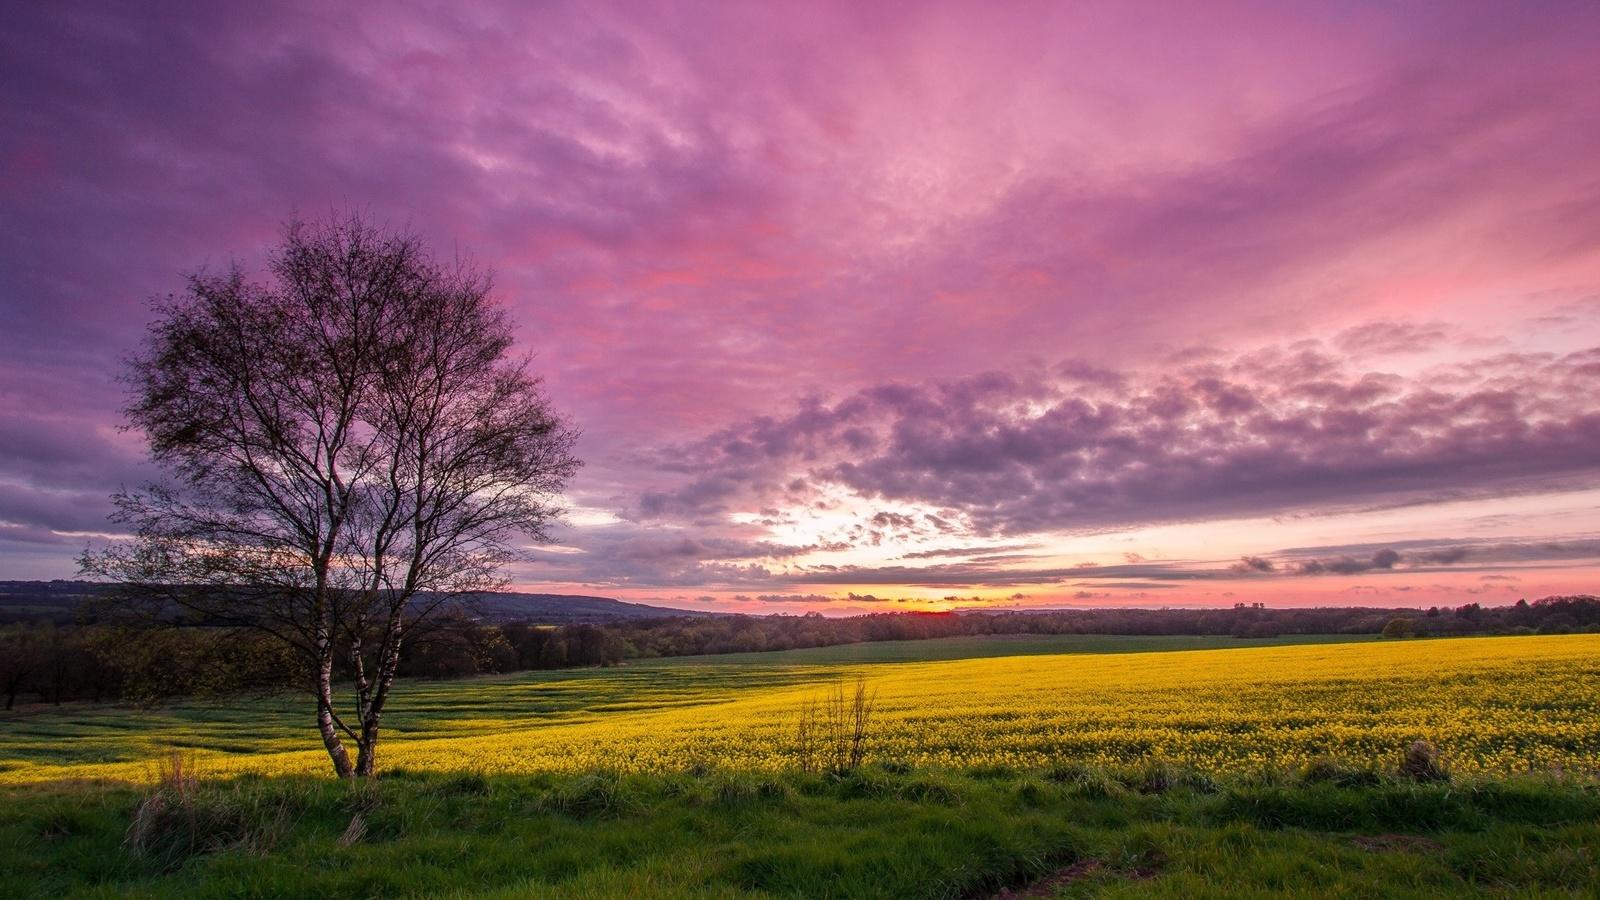 закат, рапс, поле, деревья, небо, облака